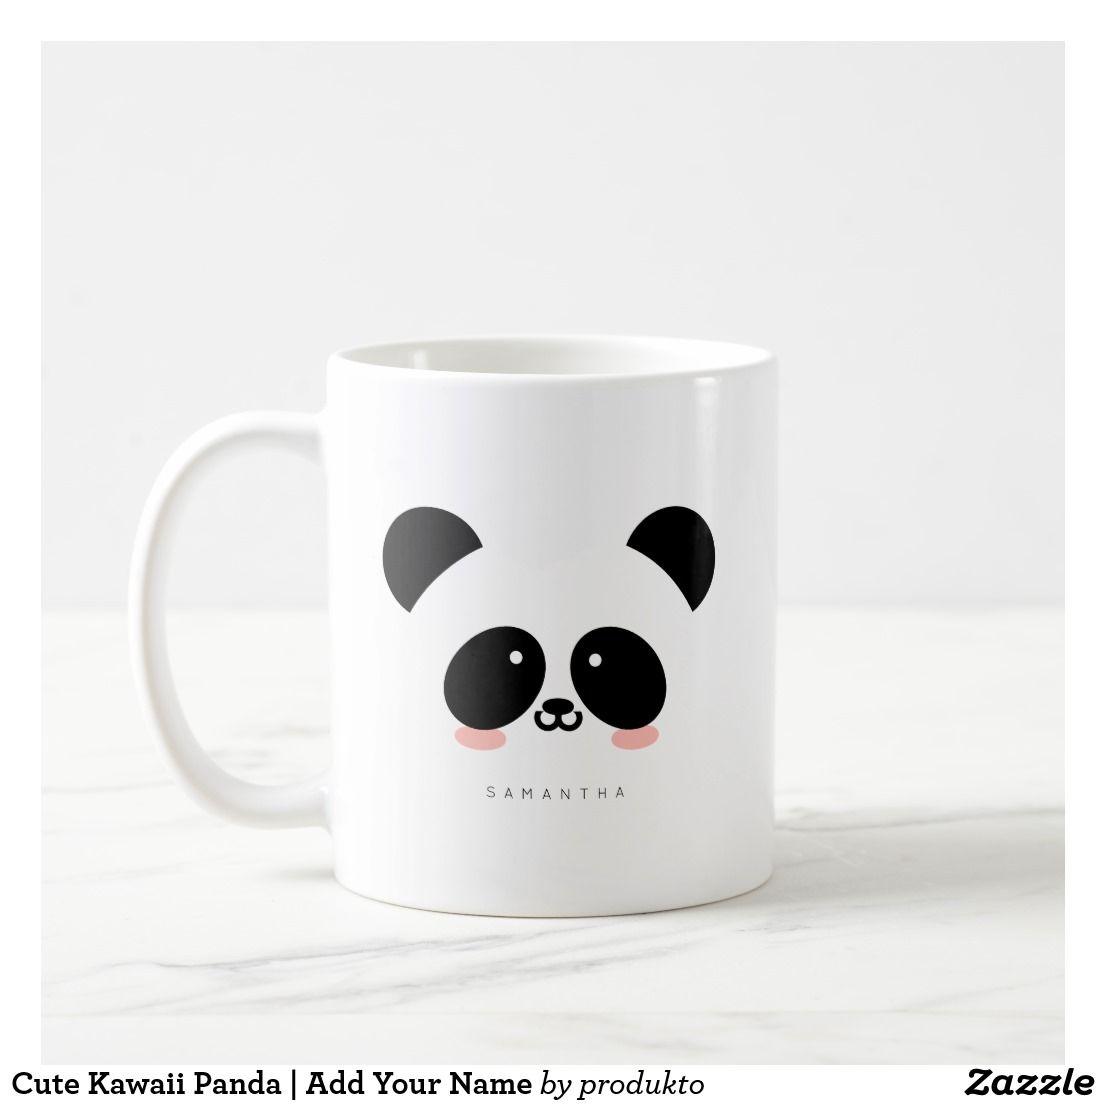 Cute Kawaii Panda Add Your Name Coffee Mug